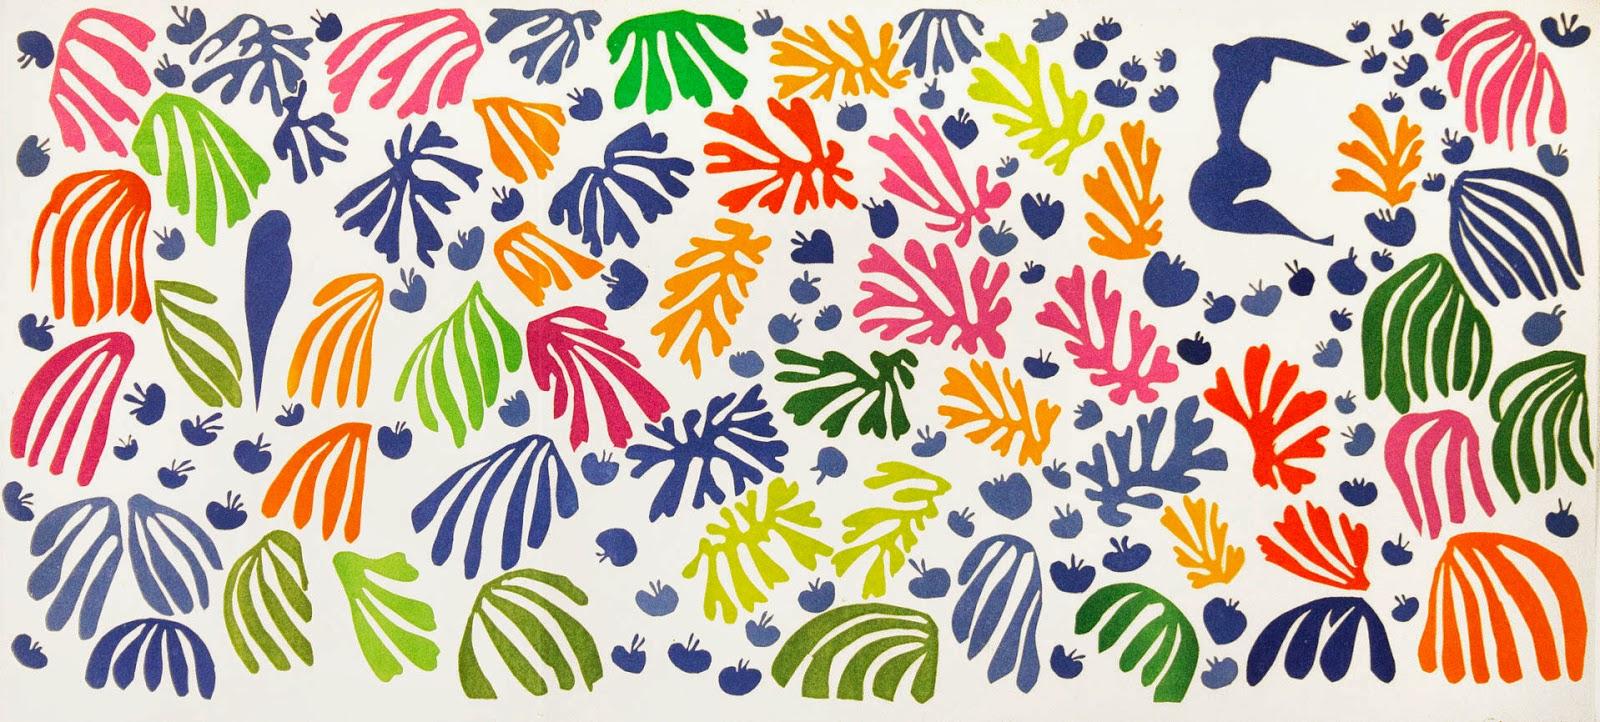 "Henri Matisse, ""La perruche et la sirène"", 1952. Matisse described this work as 'a little garden all around me where I can walk'."